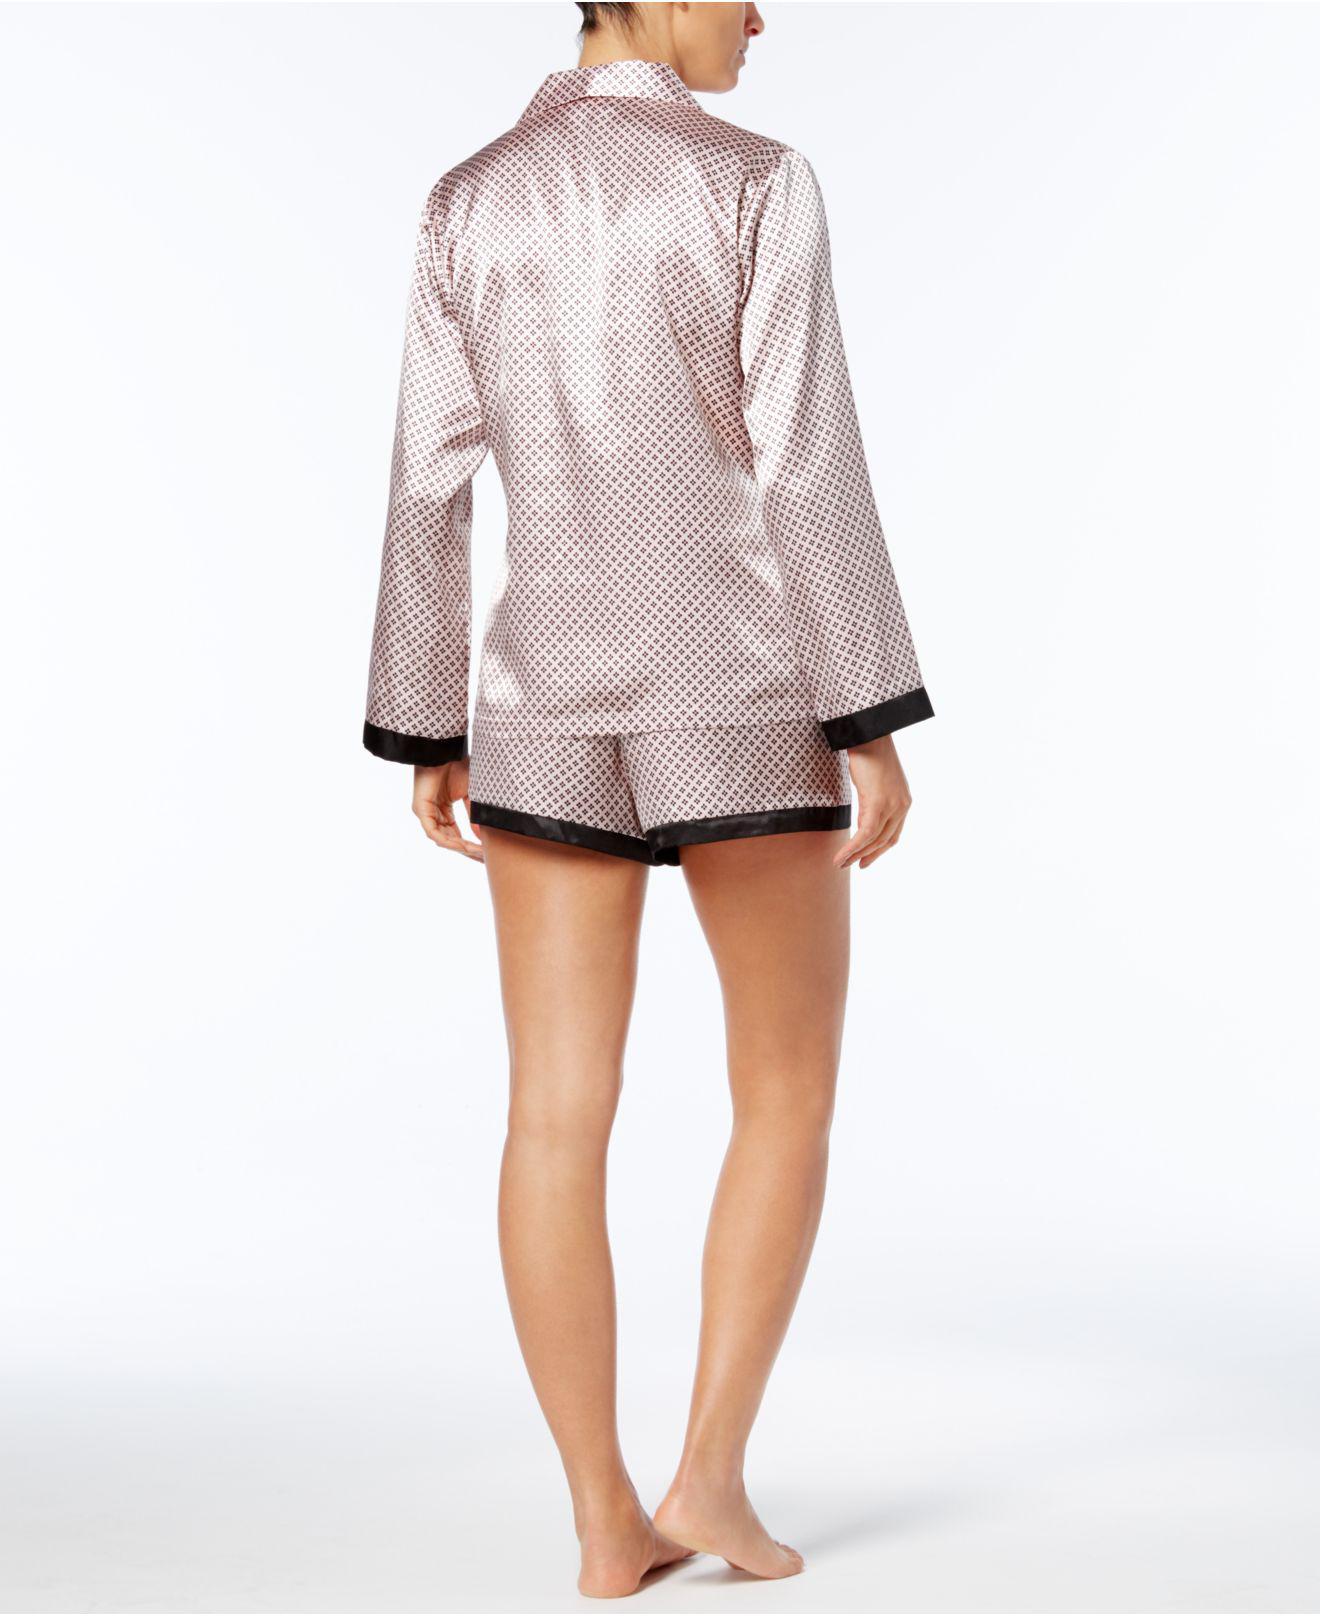 d1a7a1cbe9 Lyst - Linea Donatella Satin Pinstripe Pajama Set in Pink